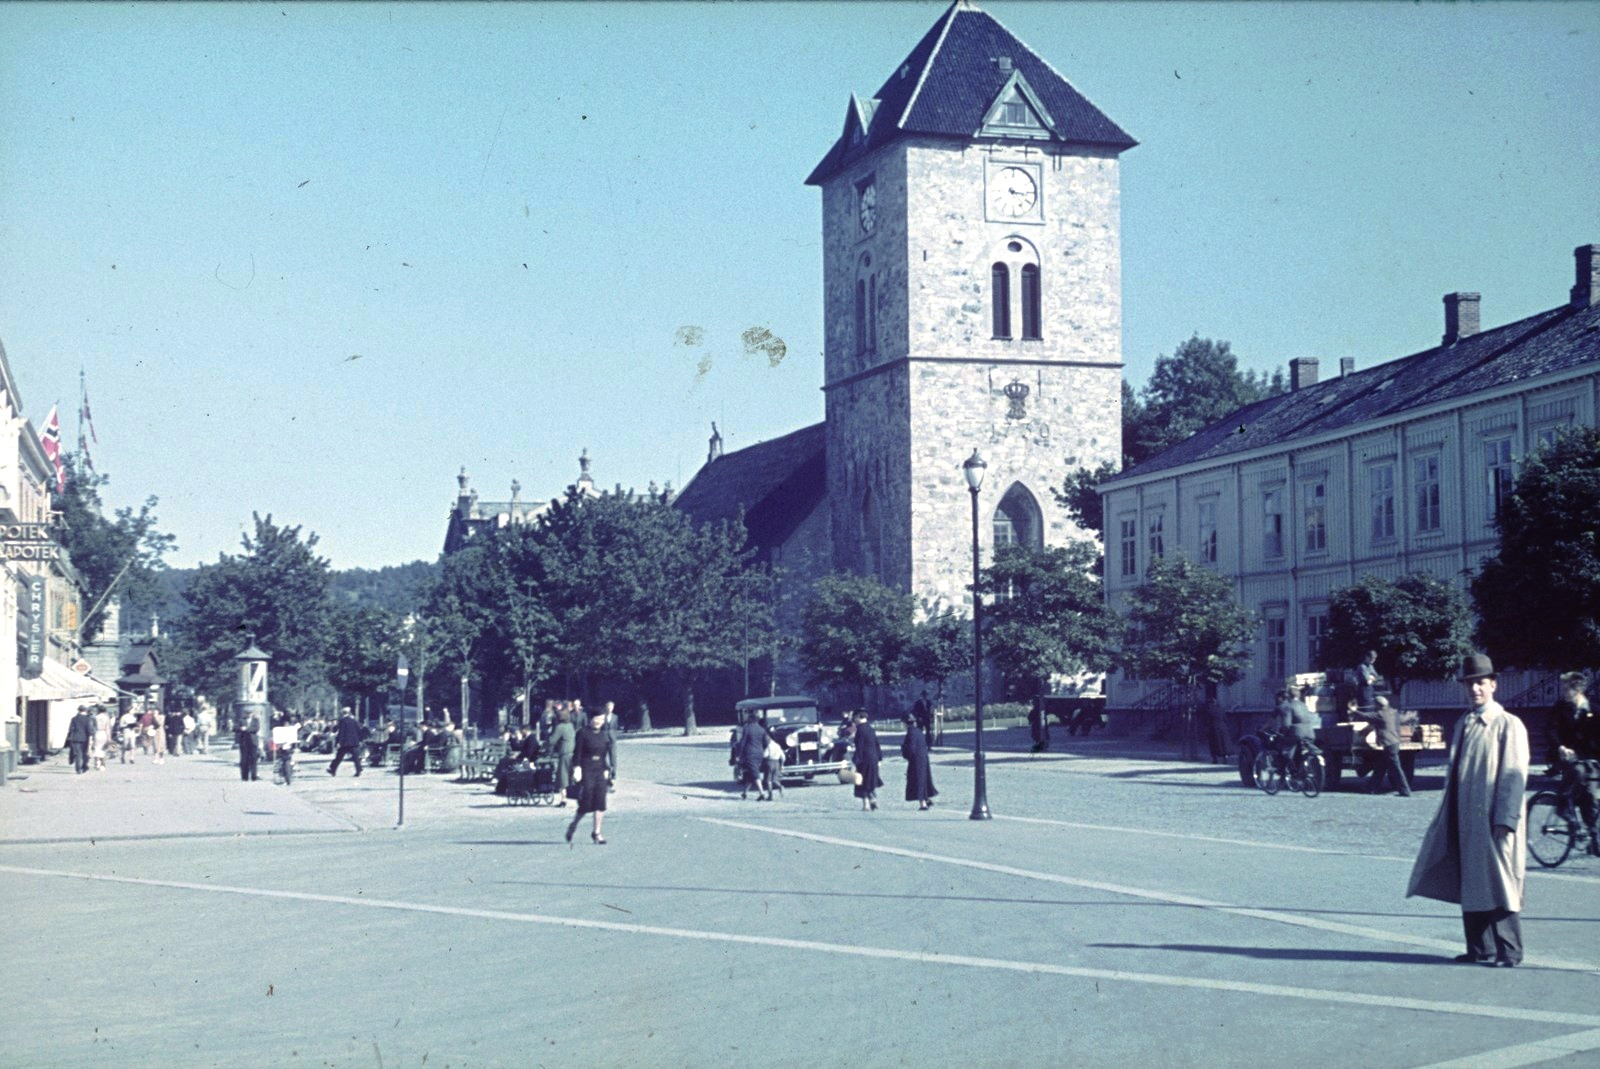 Тронхейм, ворота Конген. Вид на каменную церковь Богоматери